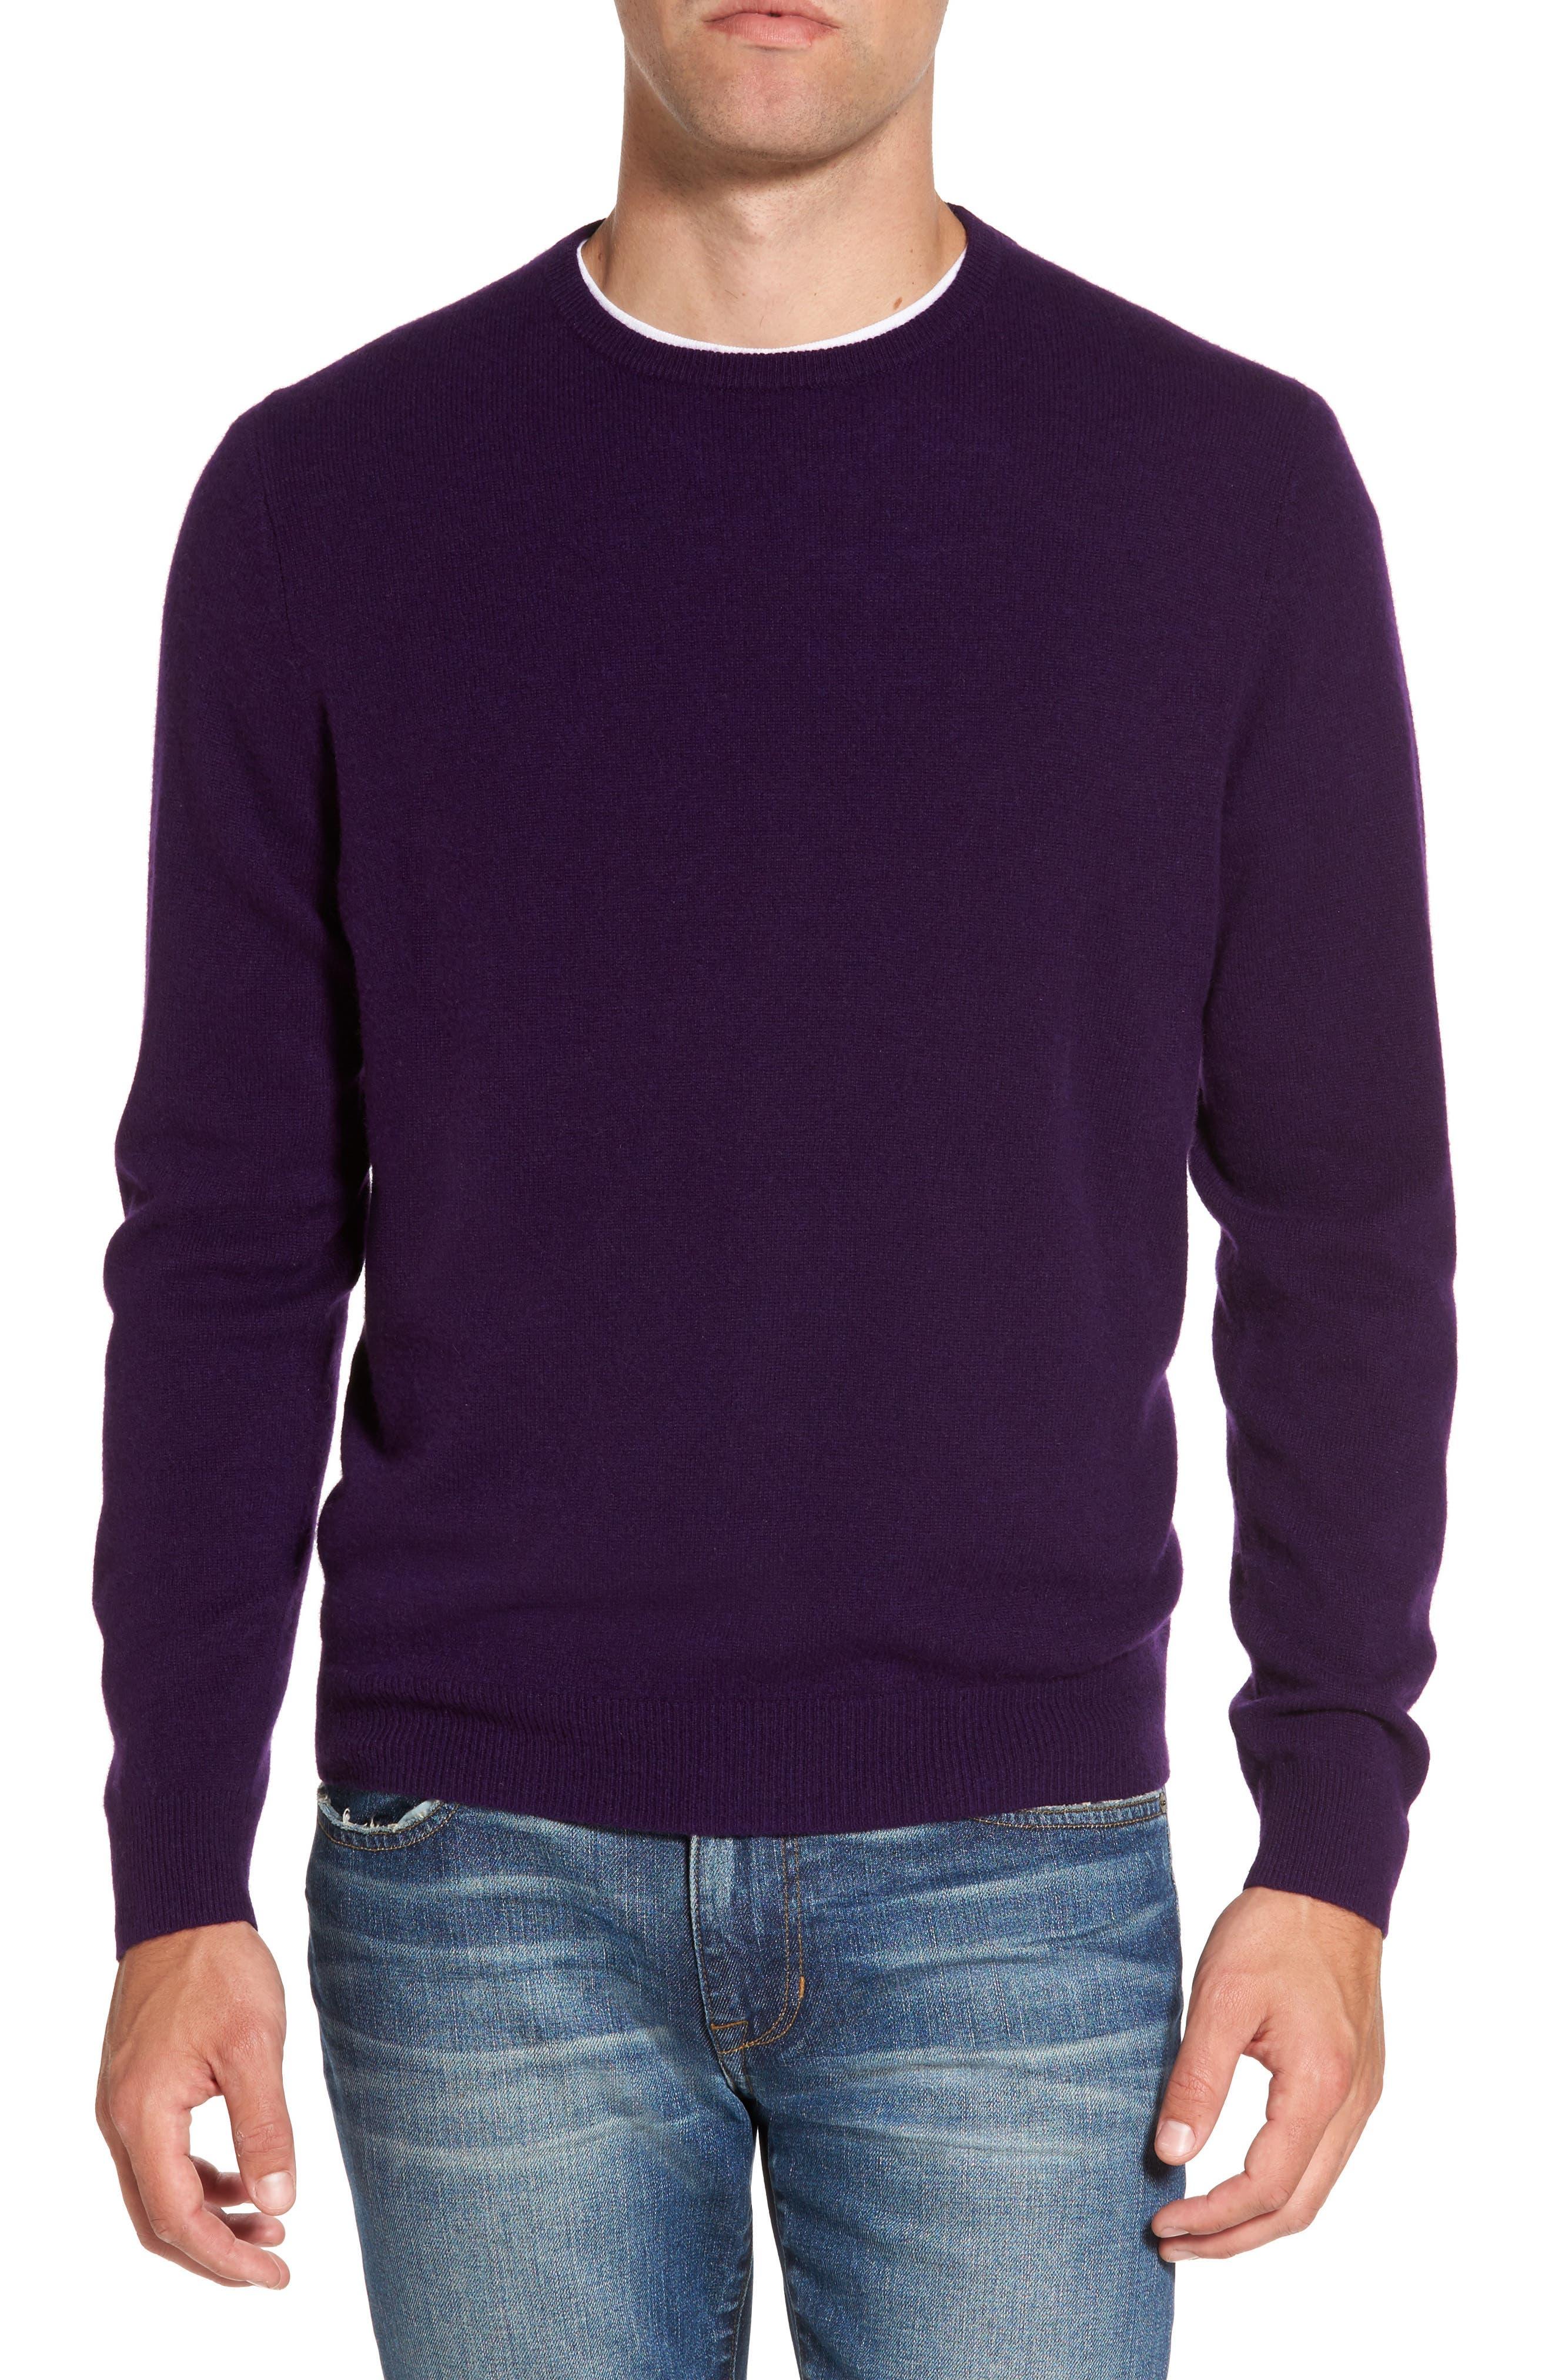 Nordstrom Shop Cashmere Crewneck Sweater, Purple